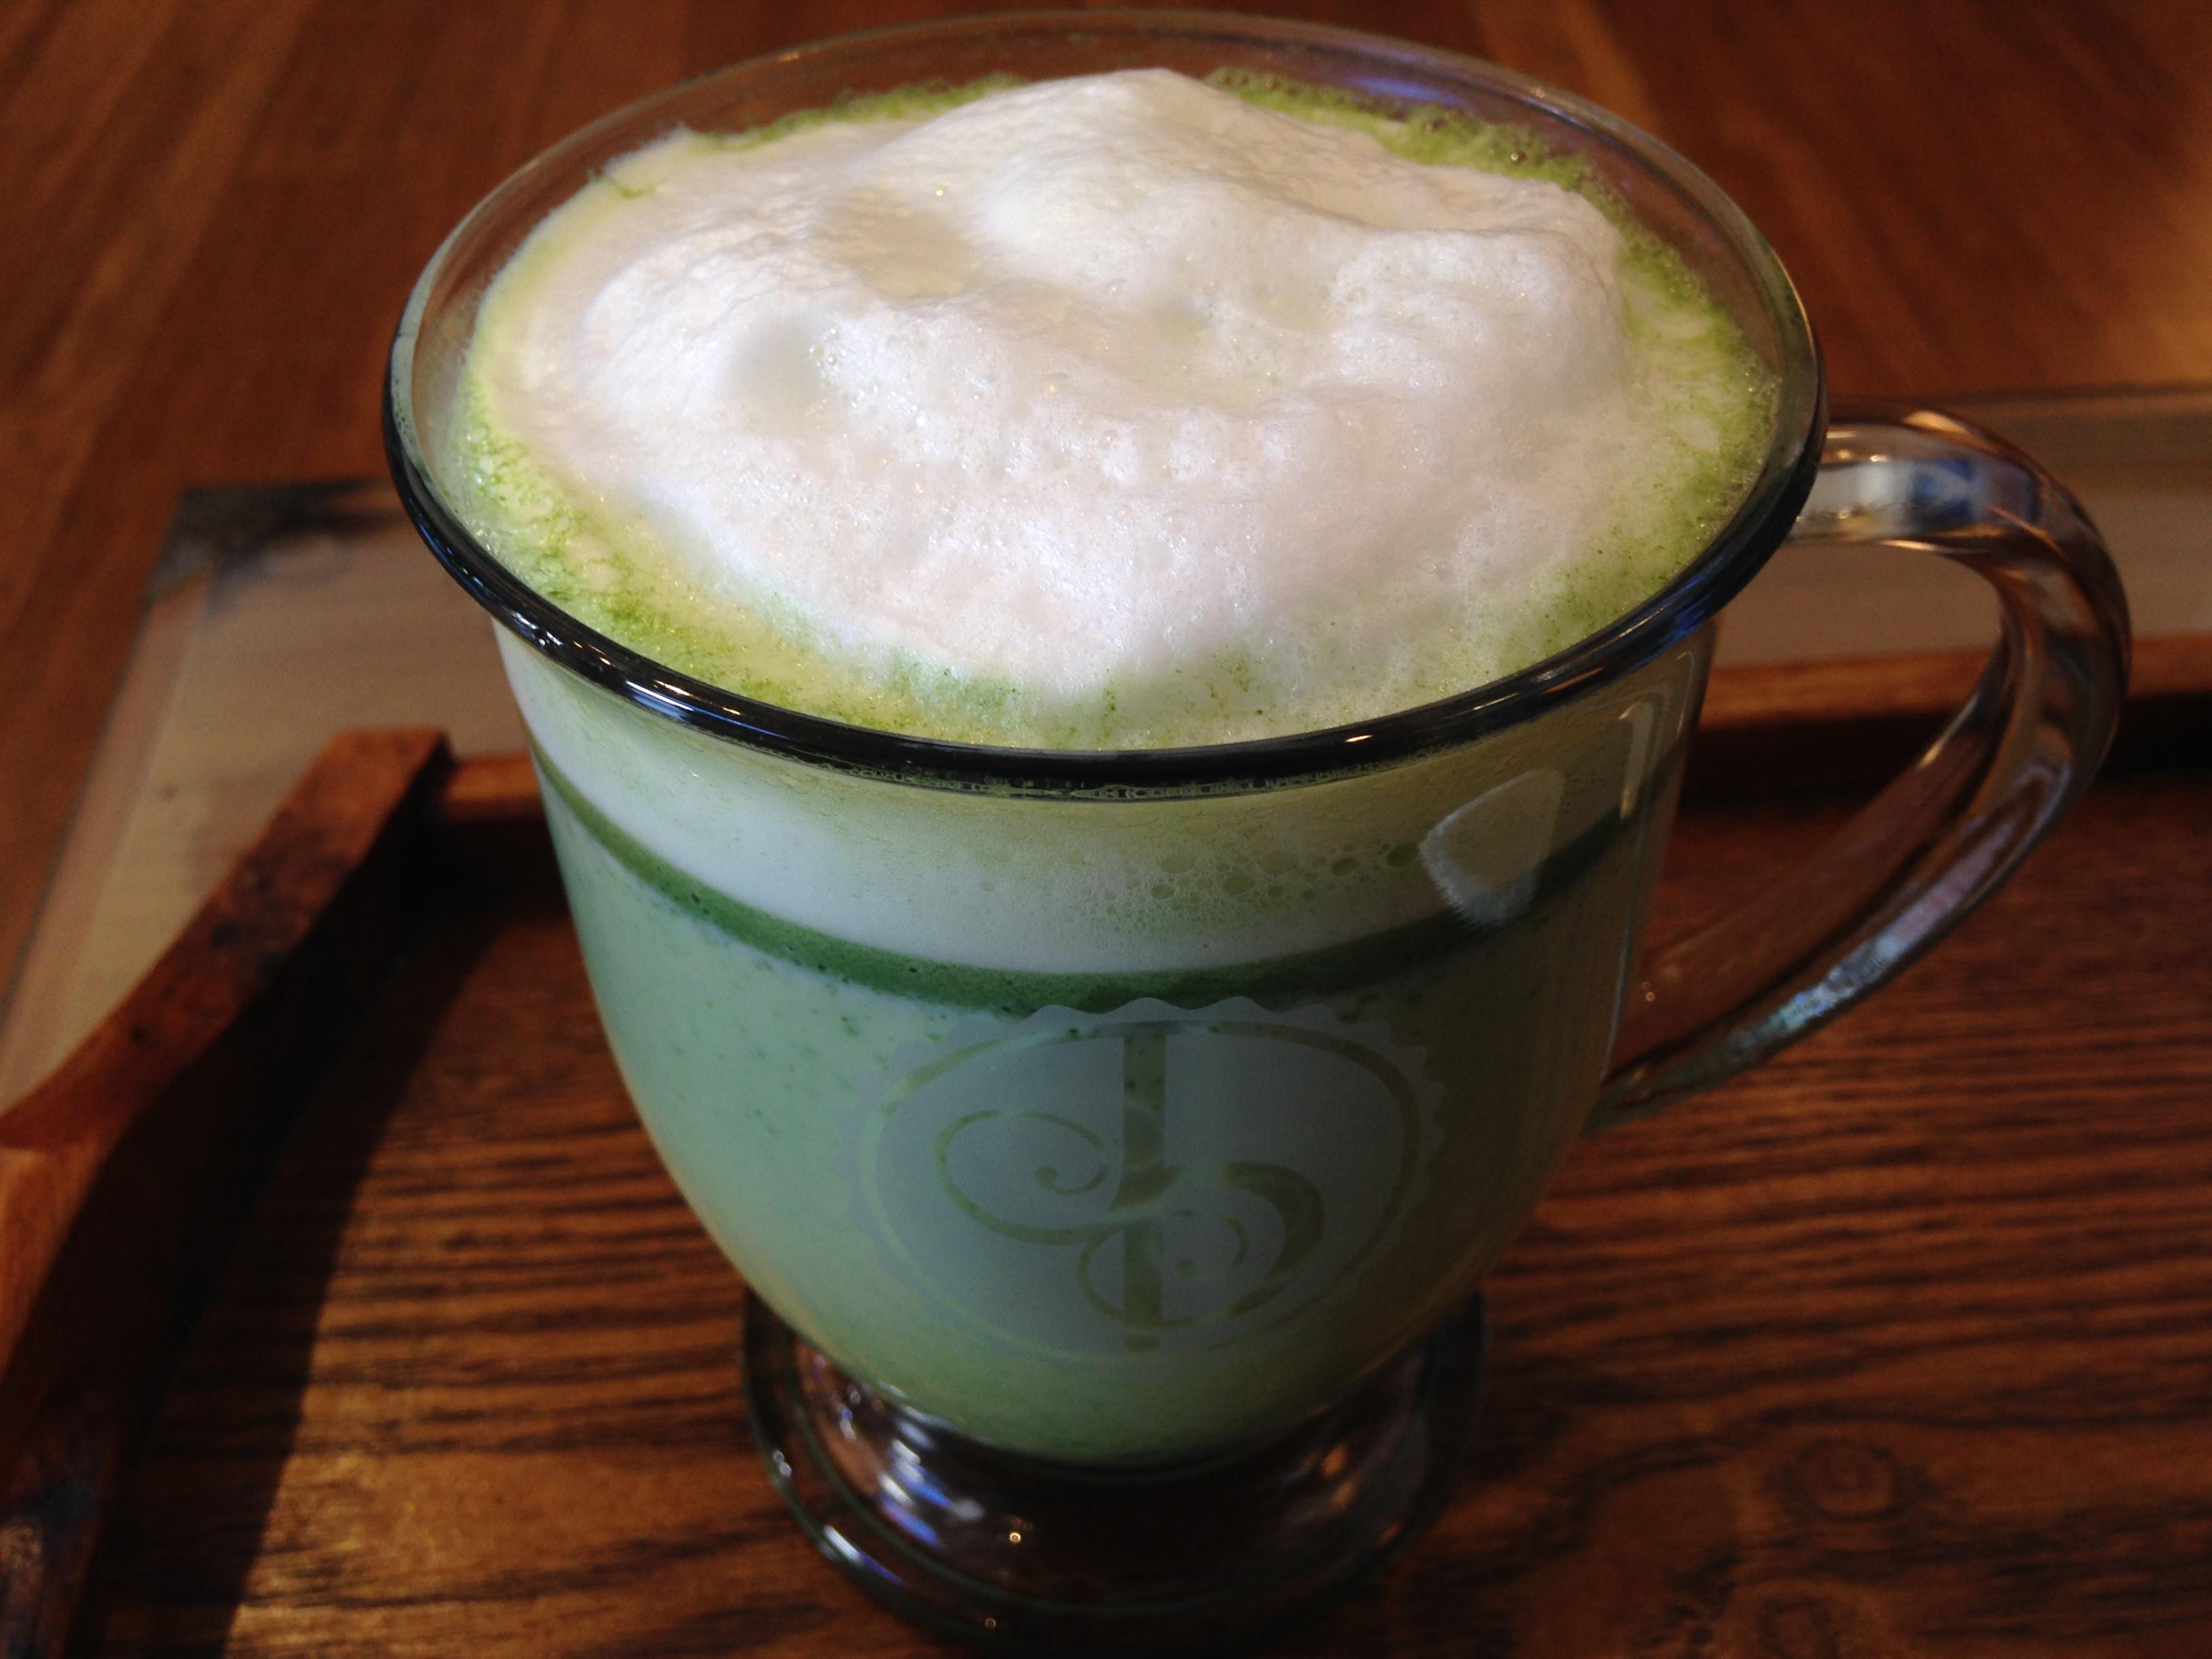 Macha tea latte at Jasmine Pearl Tea Company, photo by Carrie Uffindell